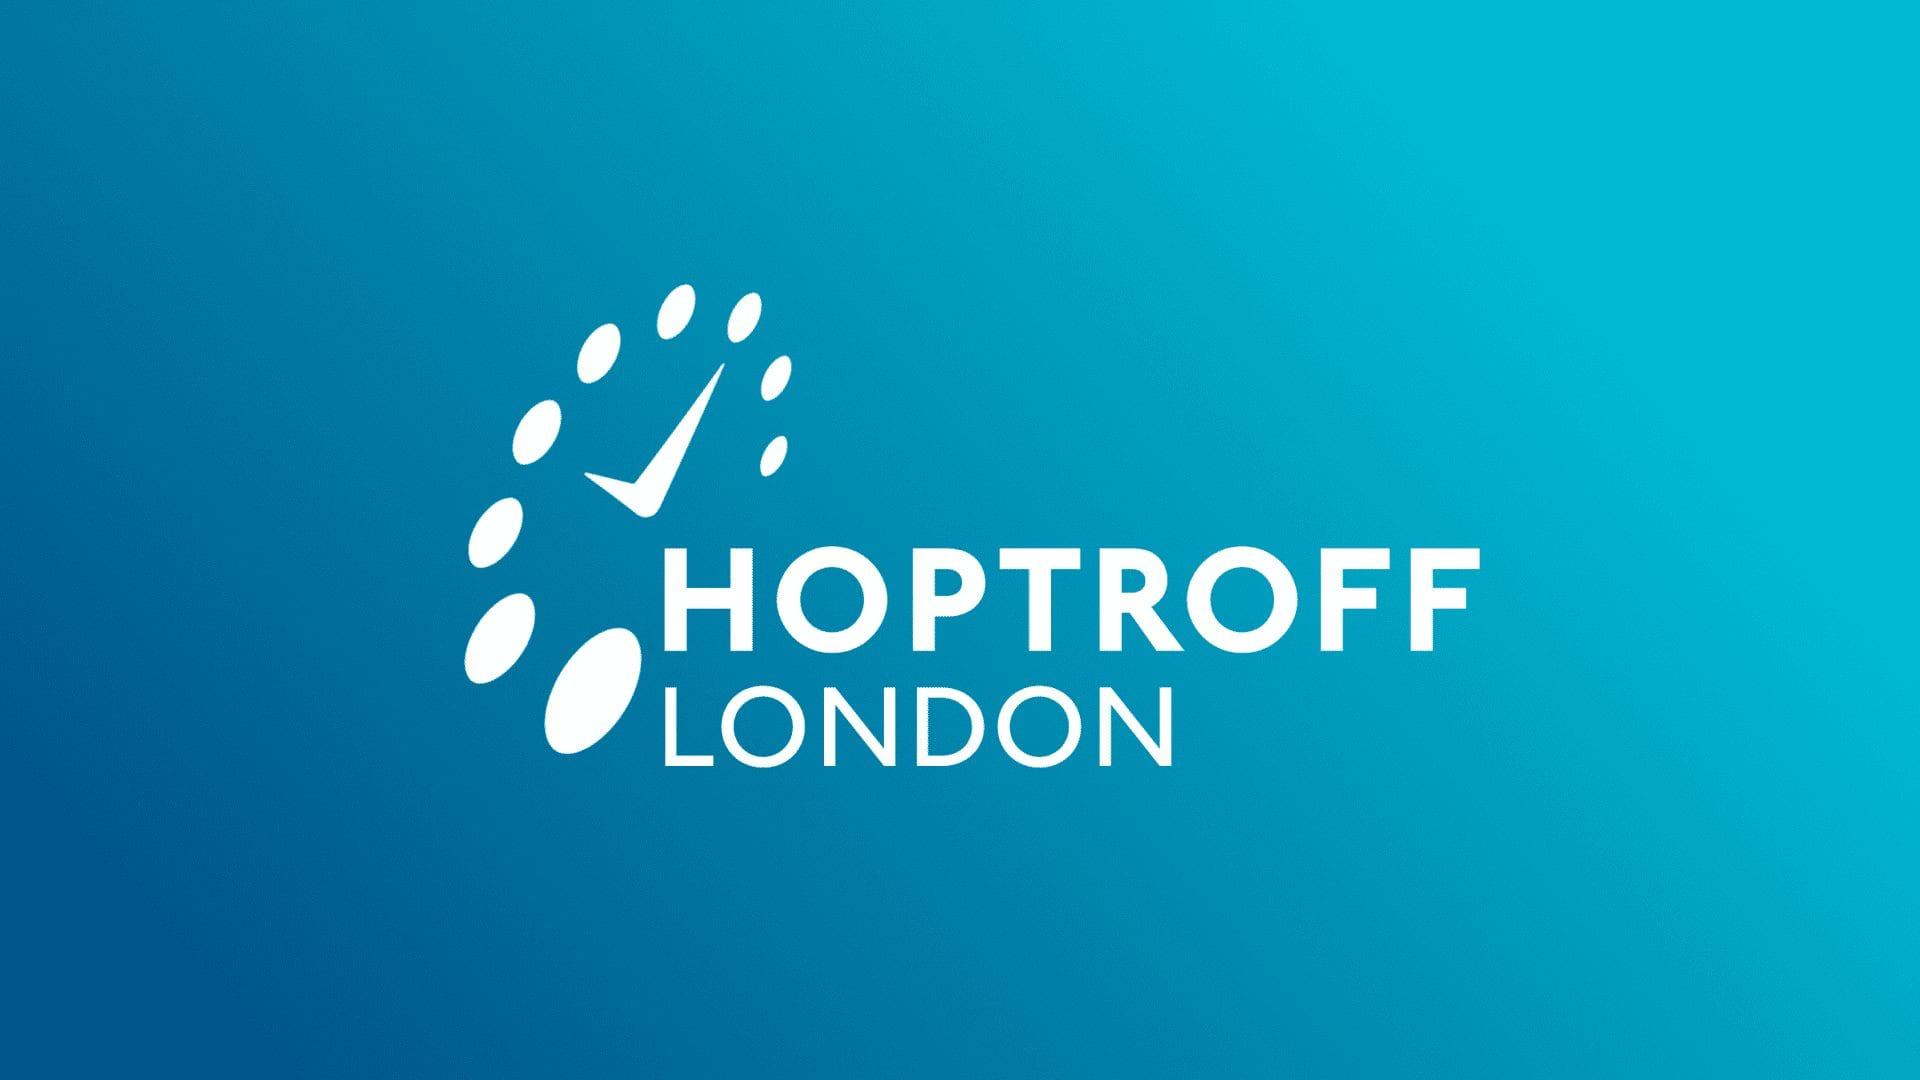 Hoptroff London Crowdfunding Image 1